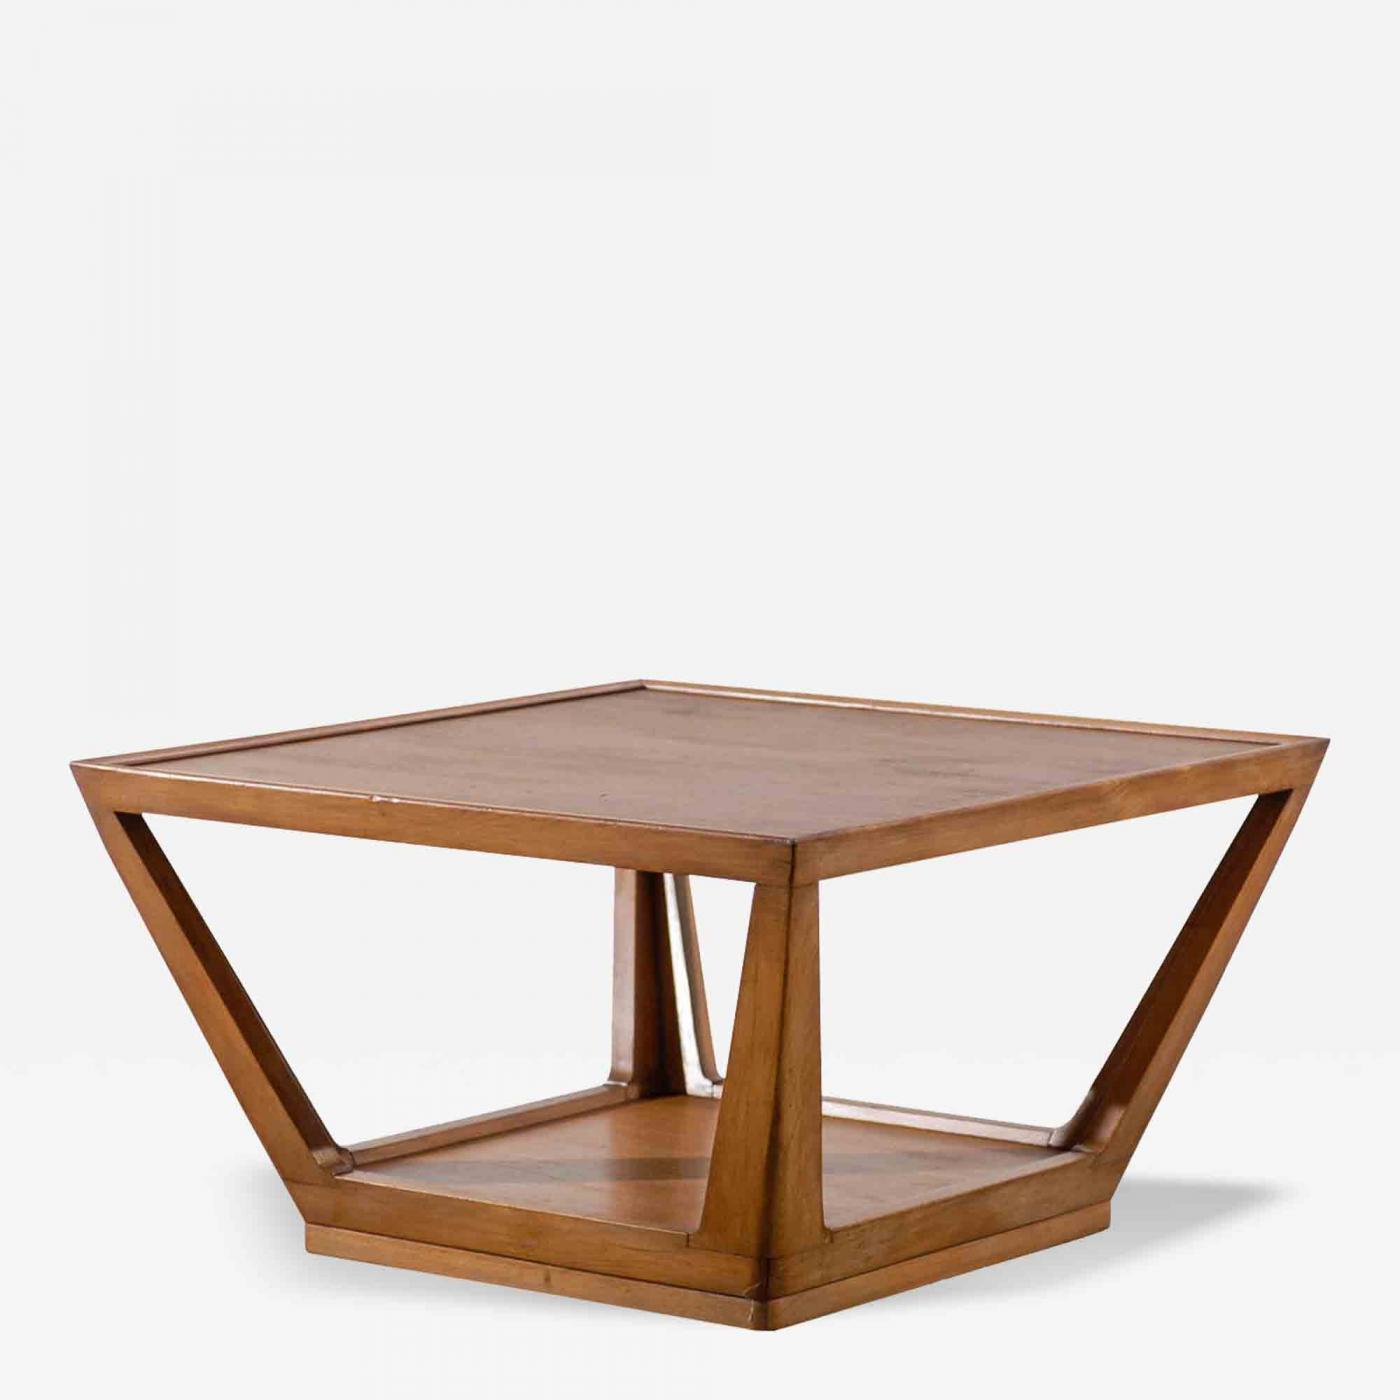 Edward Wormley Edward Wormley for Drexel Trapezoid Coffee Table